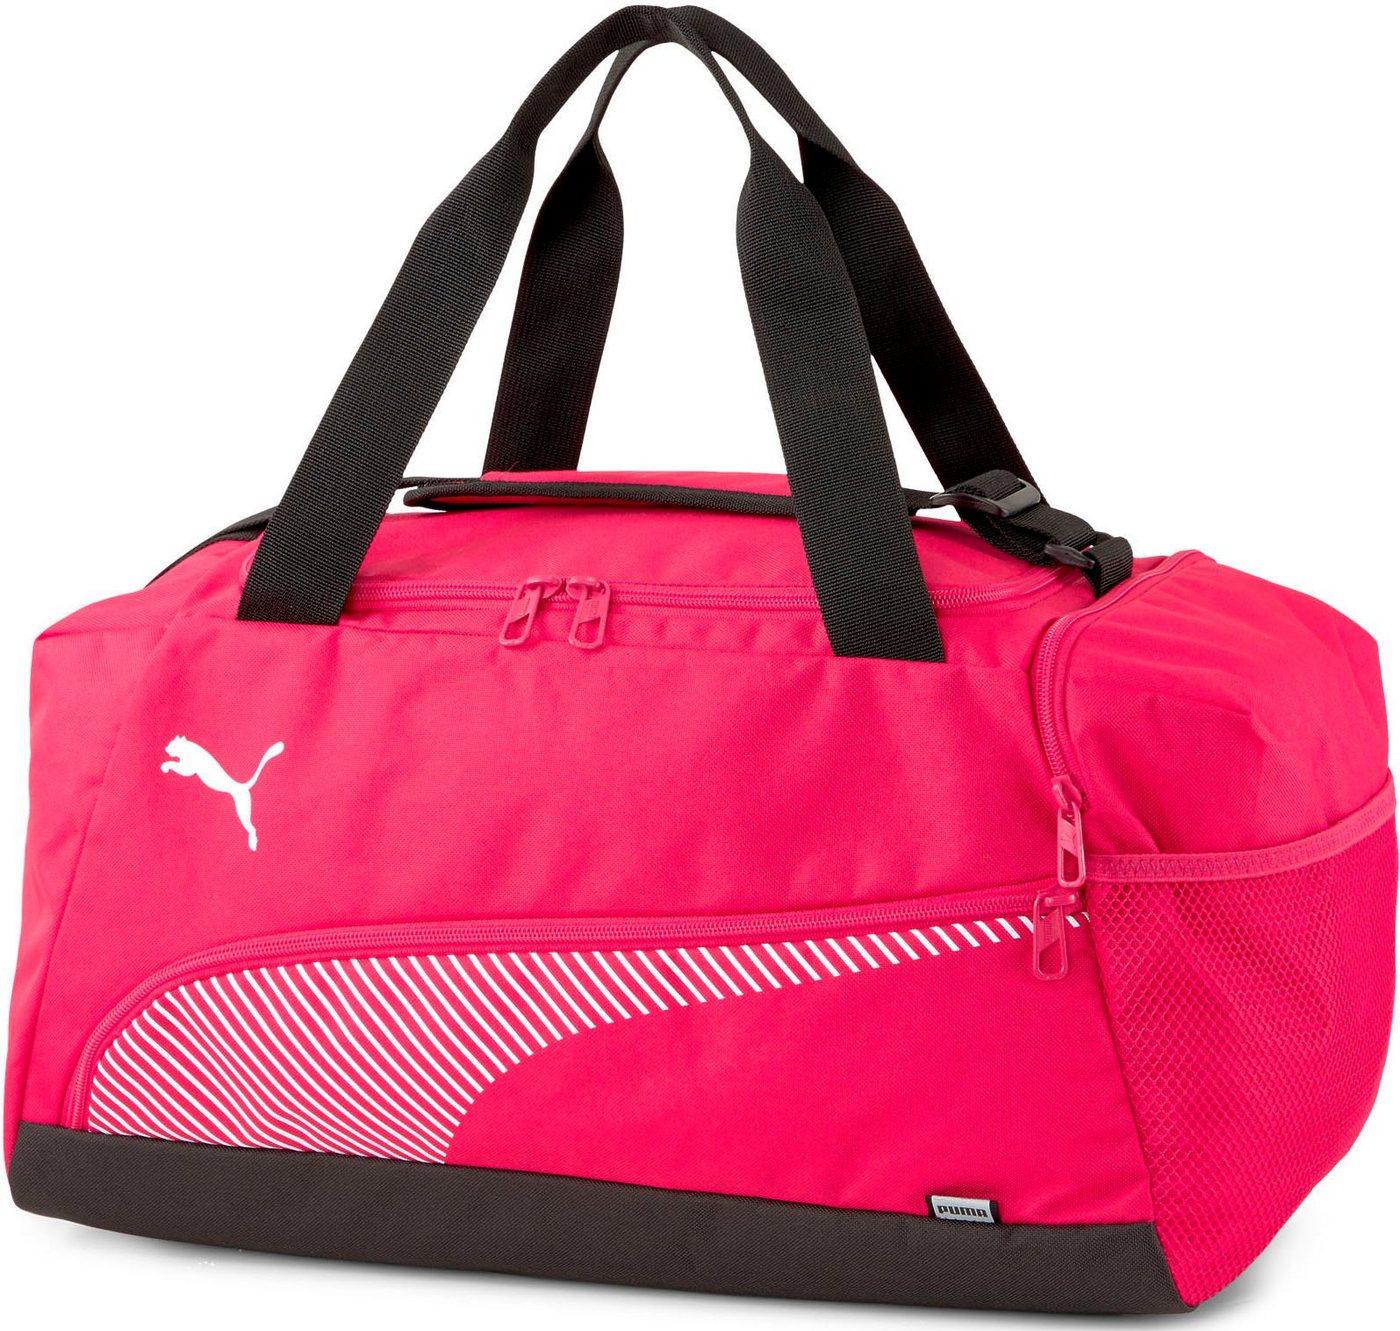 puma -  Sporttasche »Fundamentals Sports Bag S«